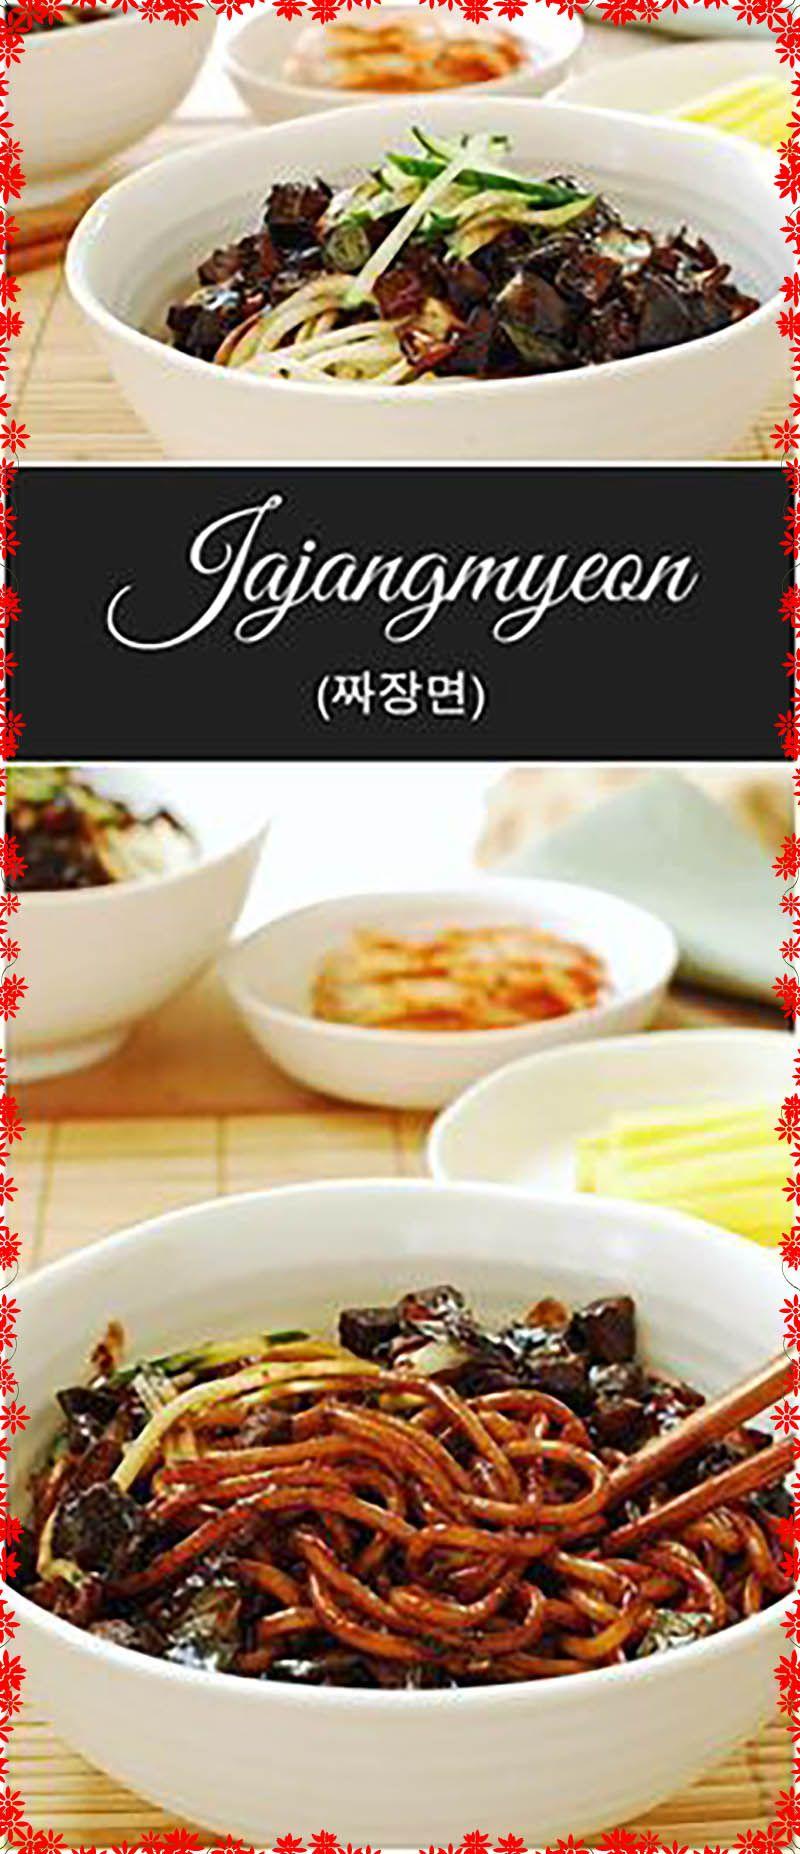 Sayur Tanduri Dengan Sos Barbeku Be Sure To Check Out This Helpful Article Wrinkles Resep Masakan Asia Resep Masakan Korea Resep Makanan